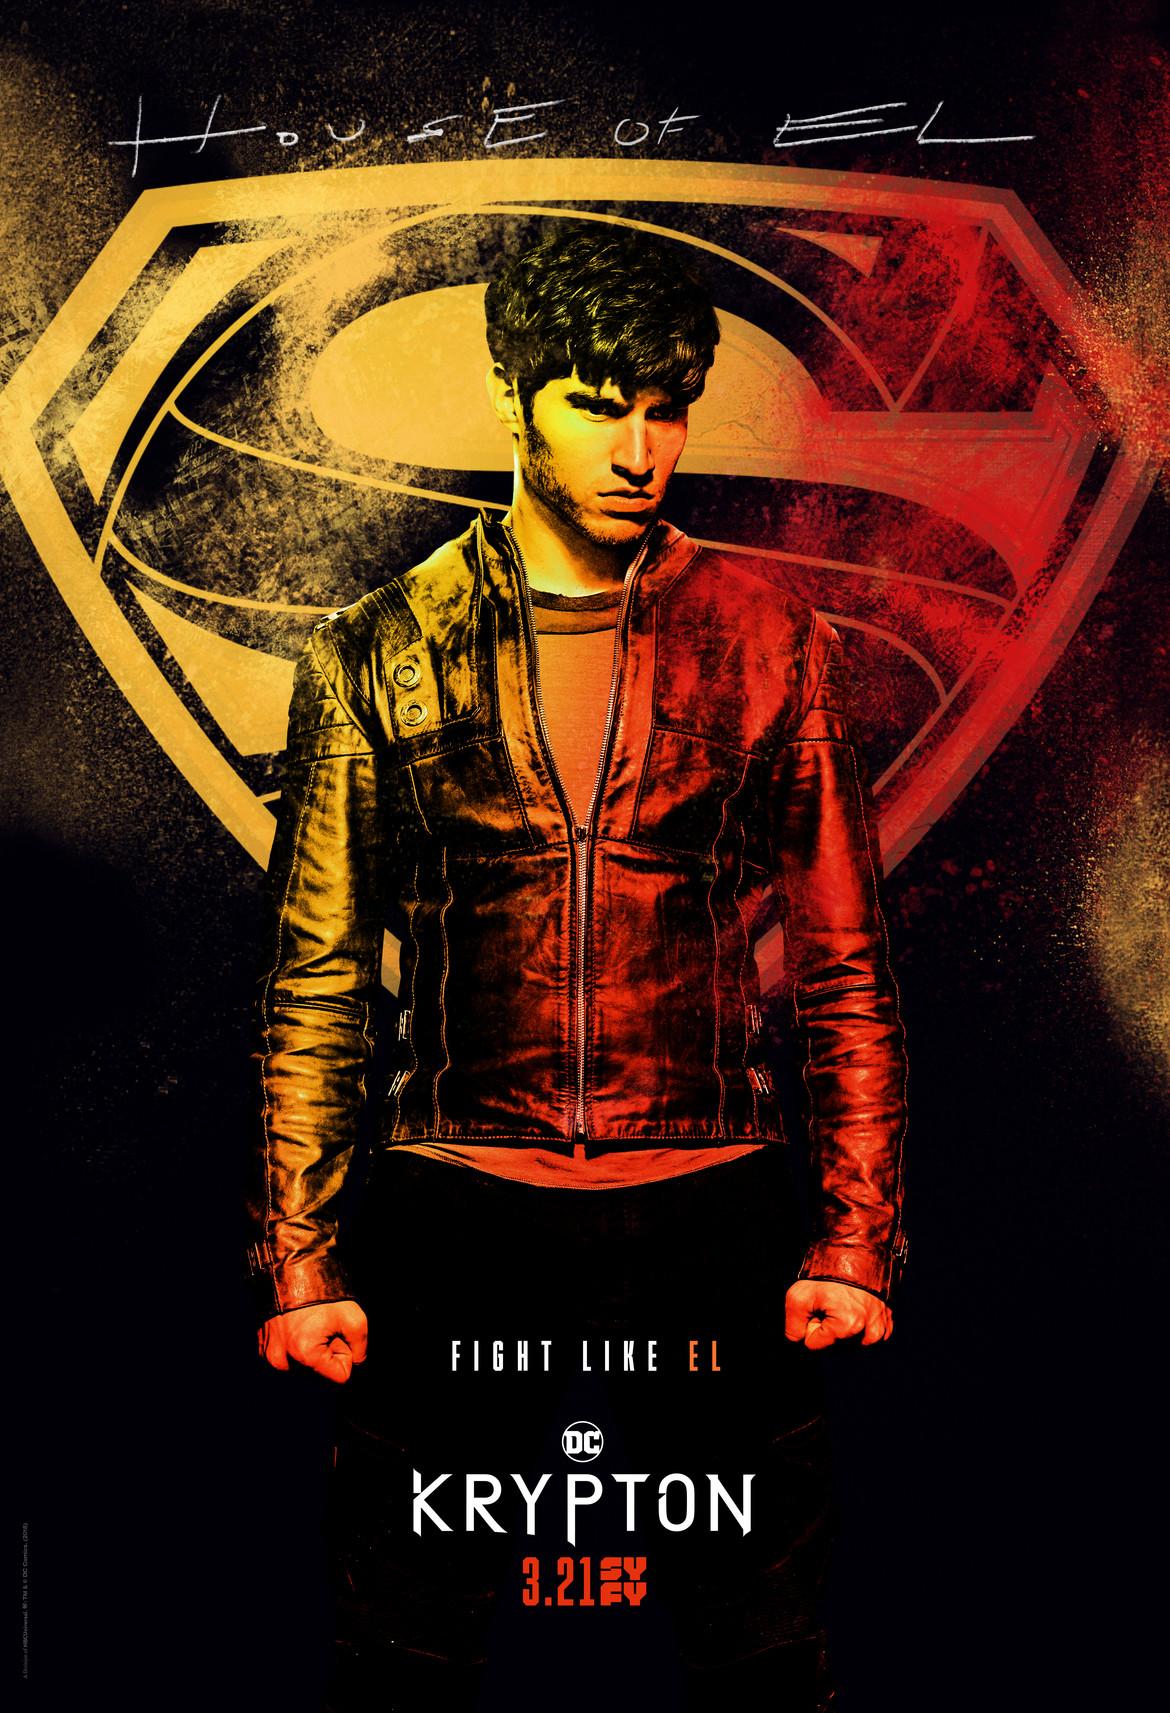 Krypton- Seyg-El spraypaint poster